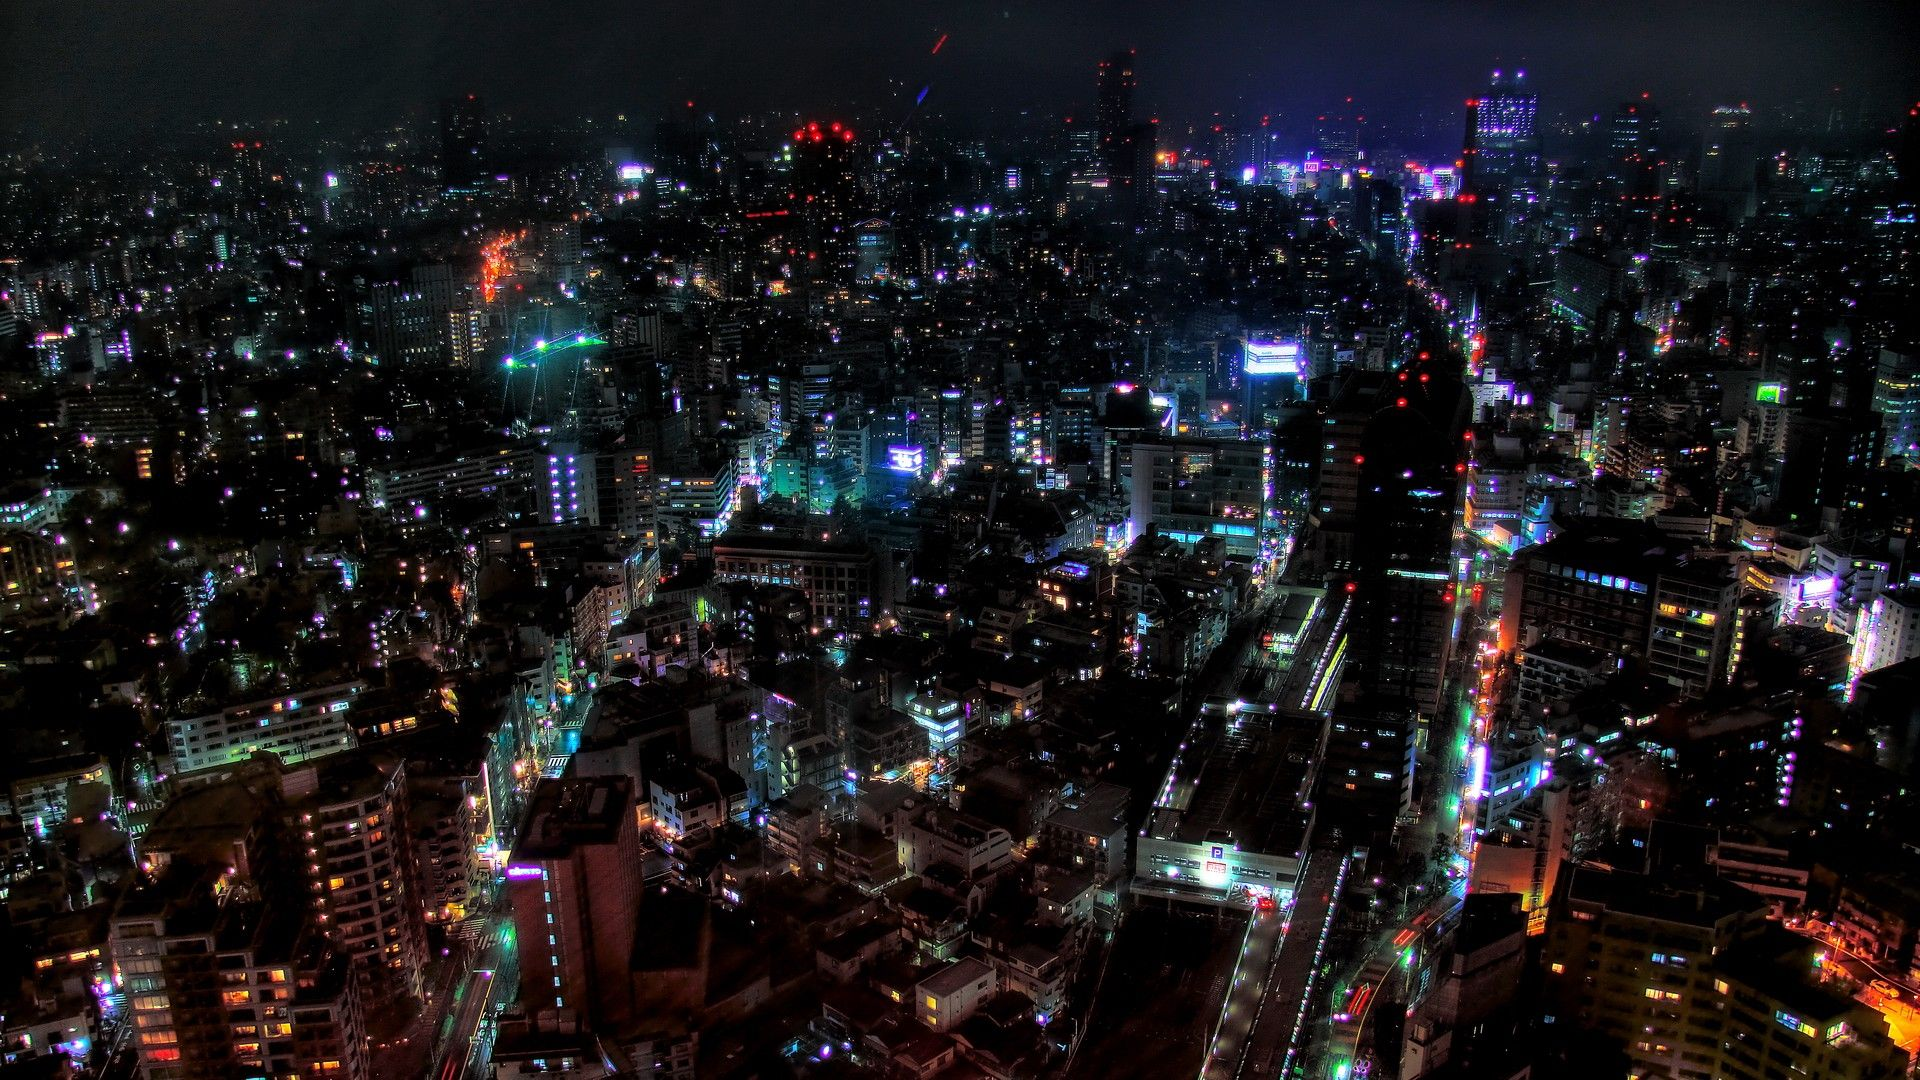 Pin By London Nance On Nebulae Anime City City Lights Wallpaper Tokyo Night